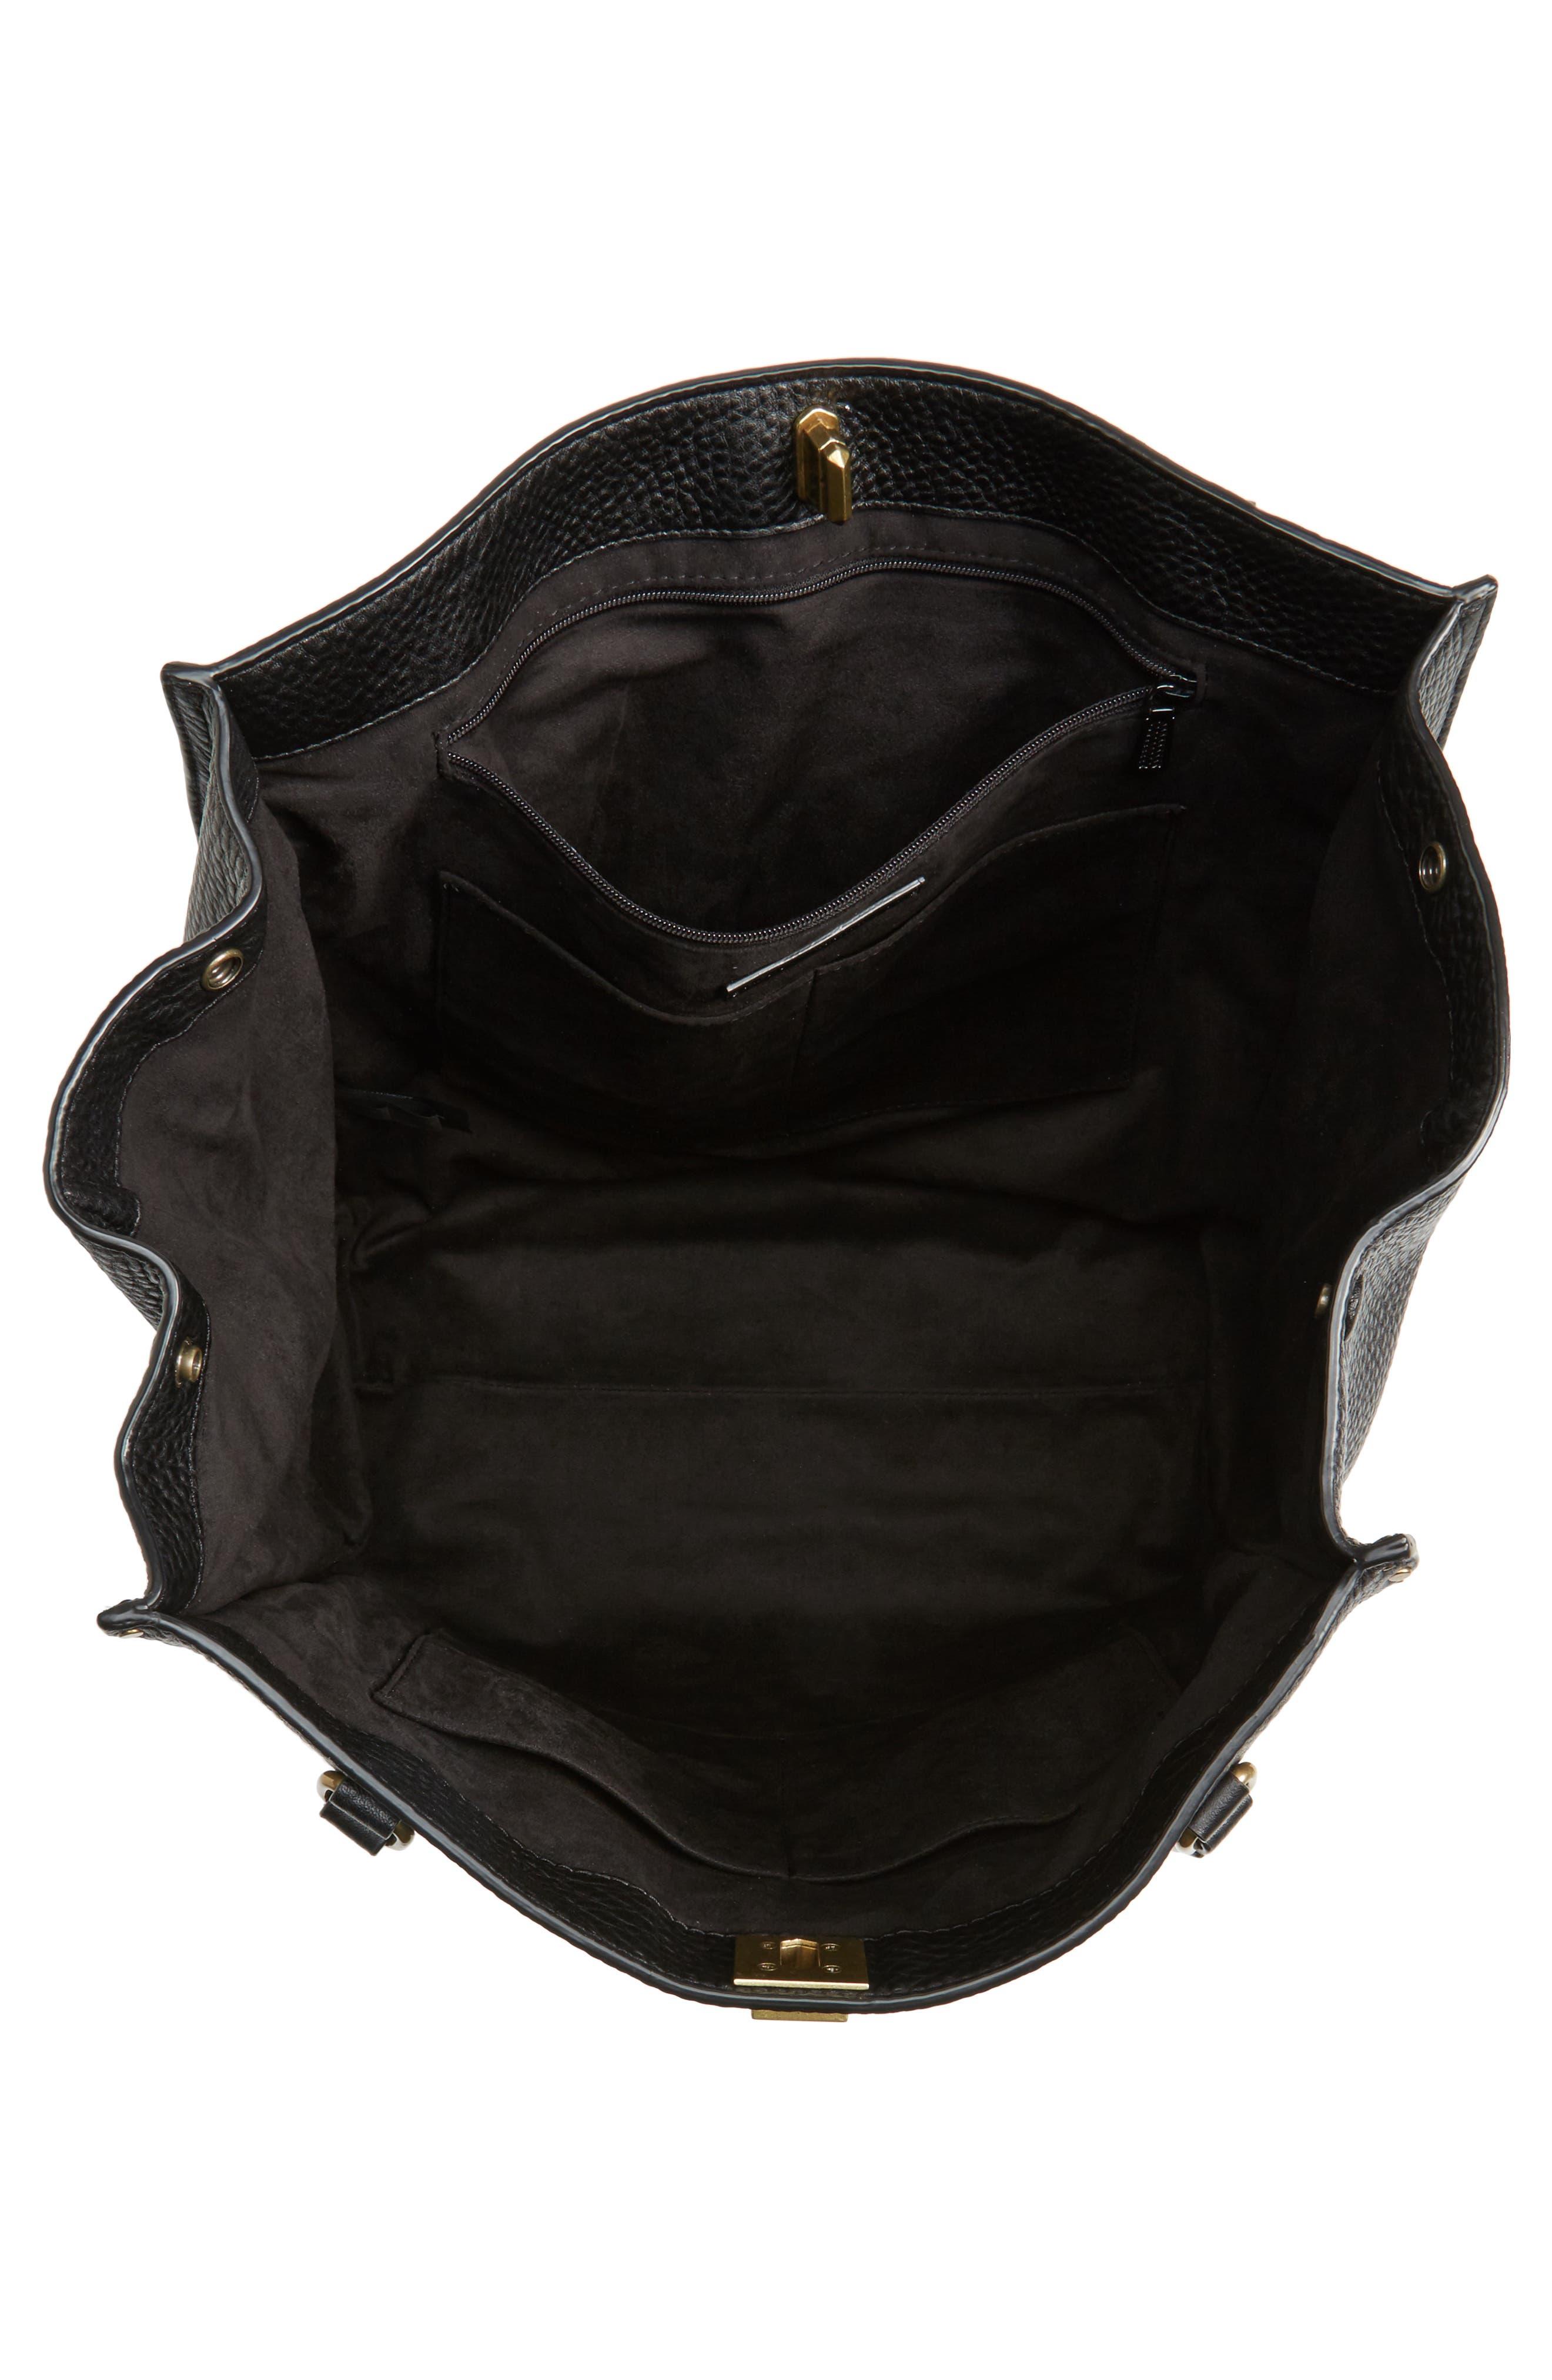 Darren Deerskin Leather Tote,                             Alternate thumbnail 4, color,                             Black